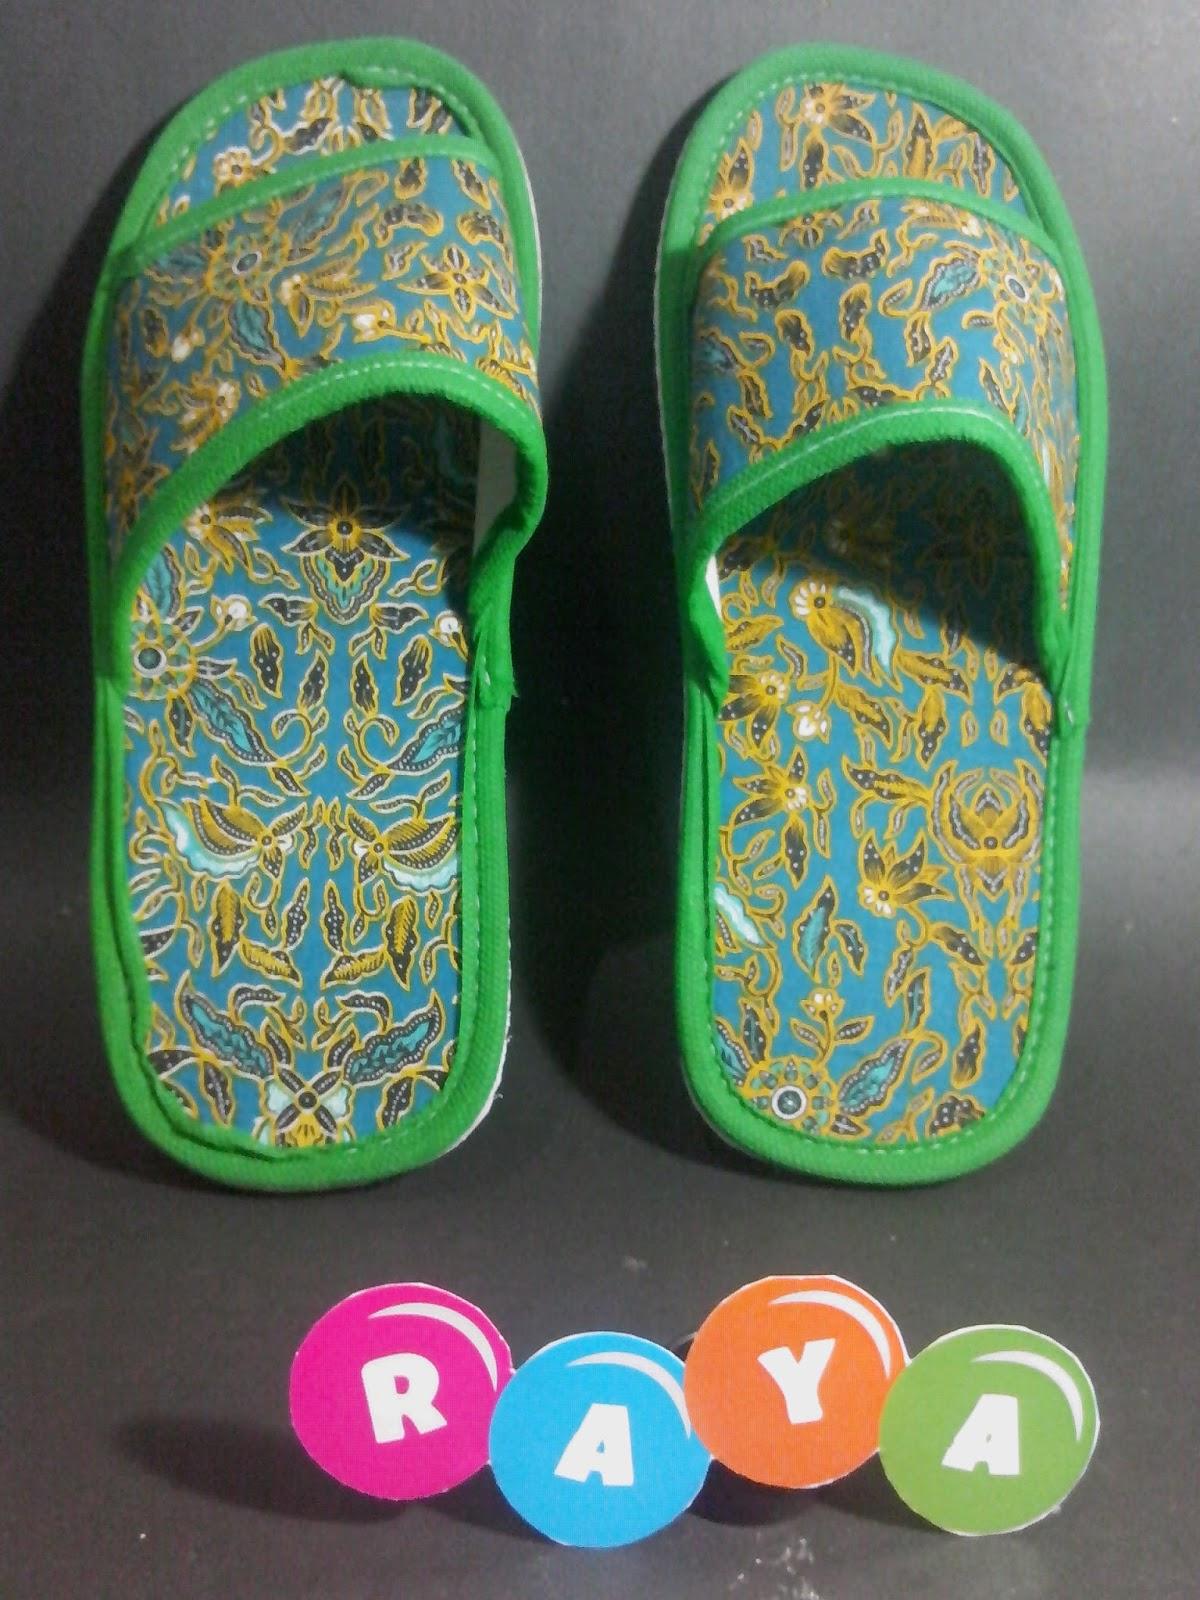 Ud Raya Amenities 0813 1742 1562 Sandal Spon Gaul Banyak Sabun Hotel Produsen Model Jahit Tebal 3 Mm 5